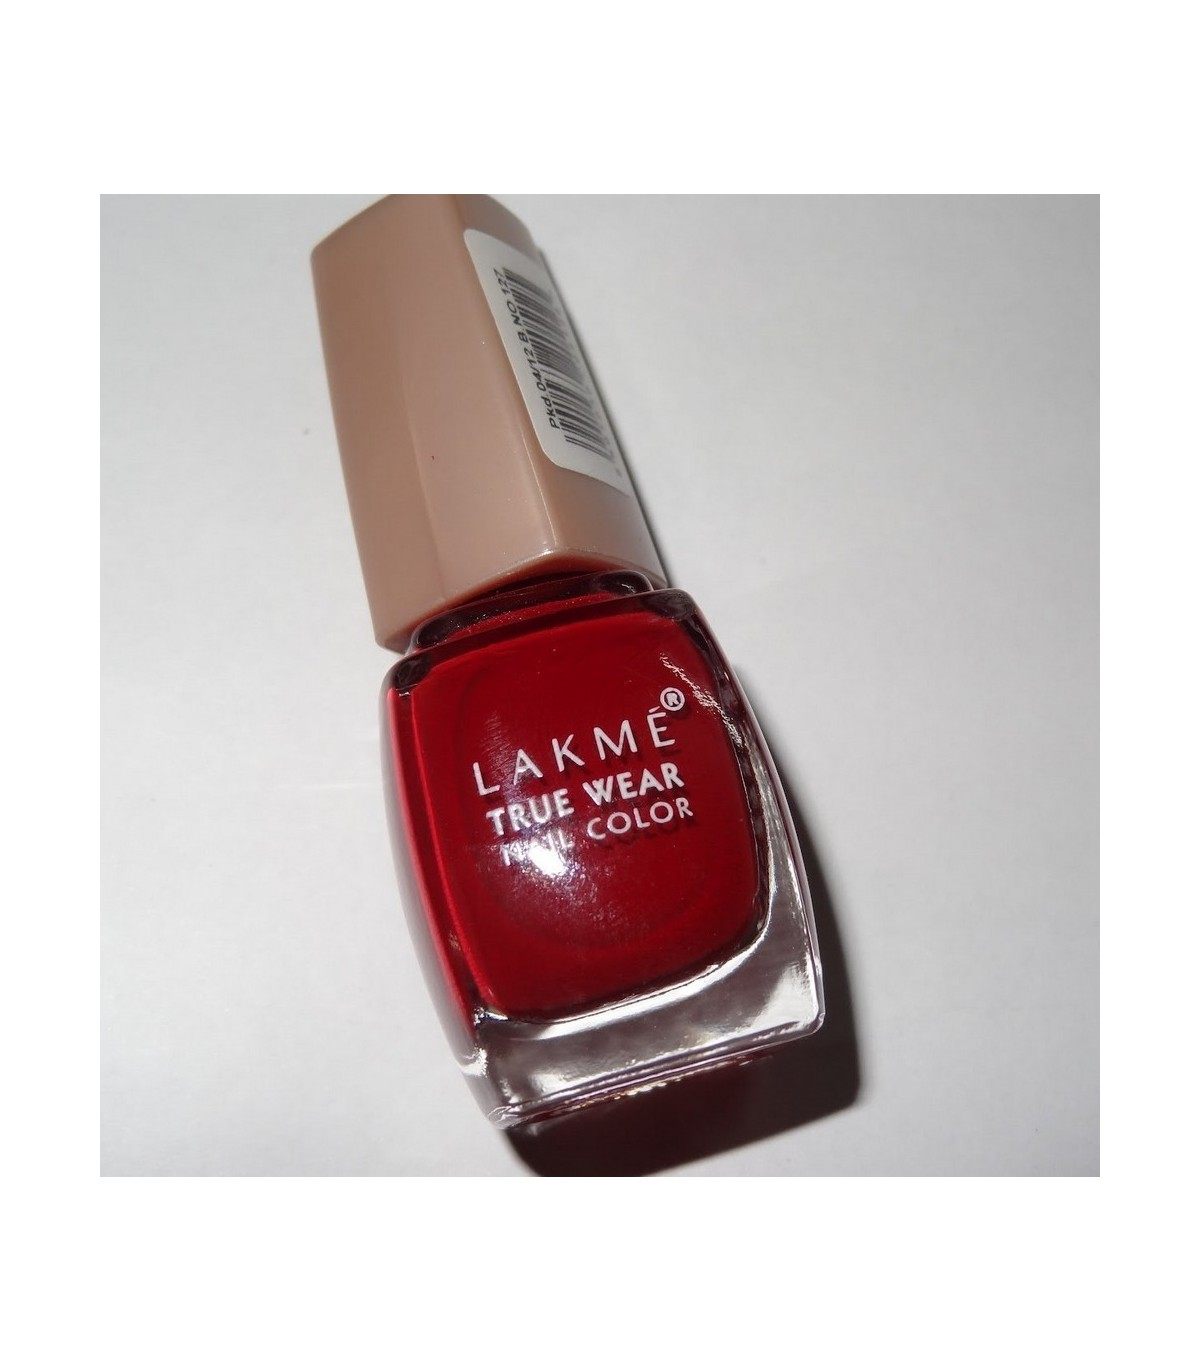 LAKME True Wear Nail Color Shade 415